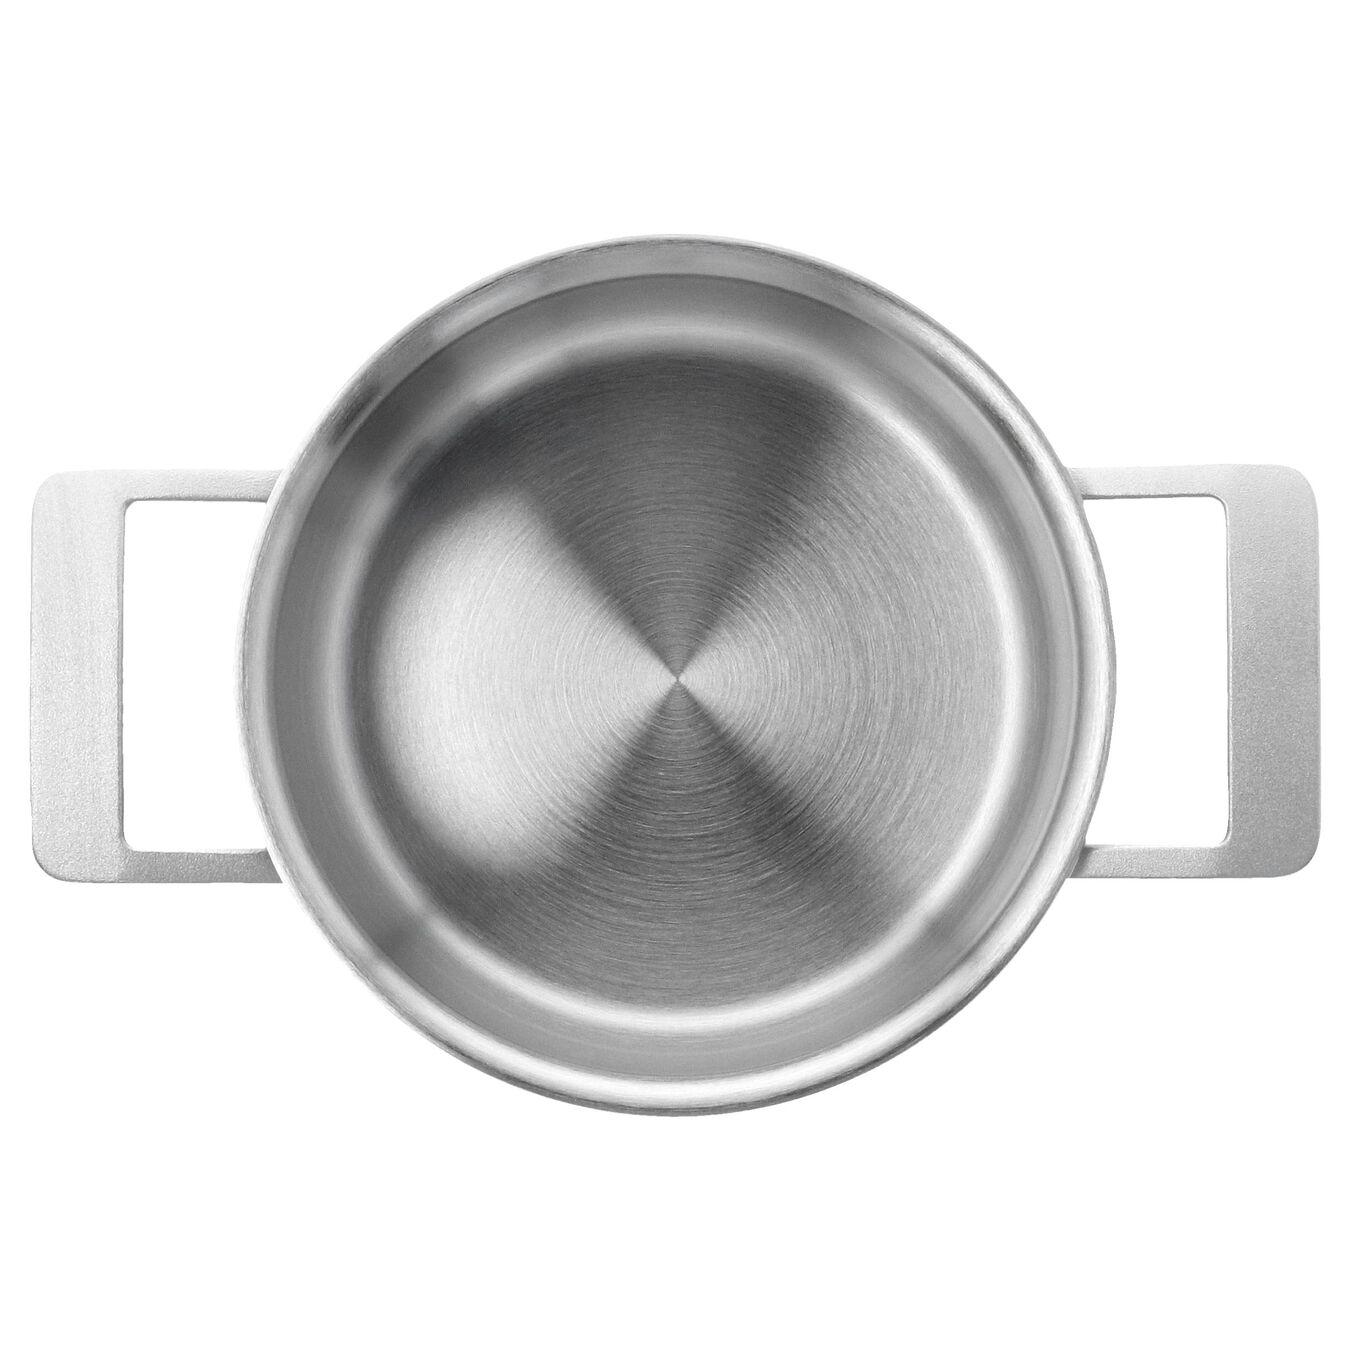 Kookpot met deksel 18 cm / 2,25 l,,large 5